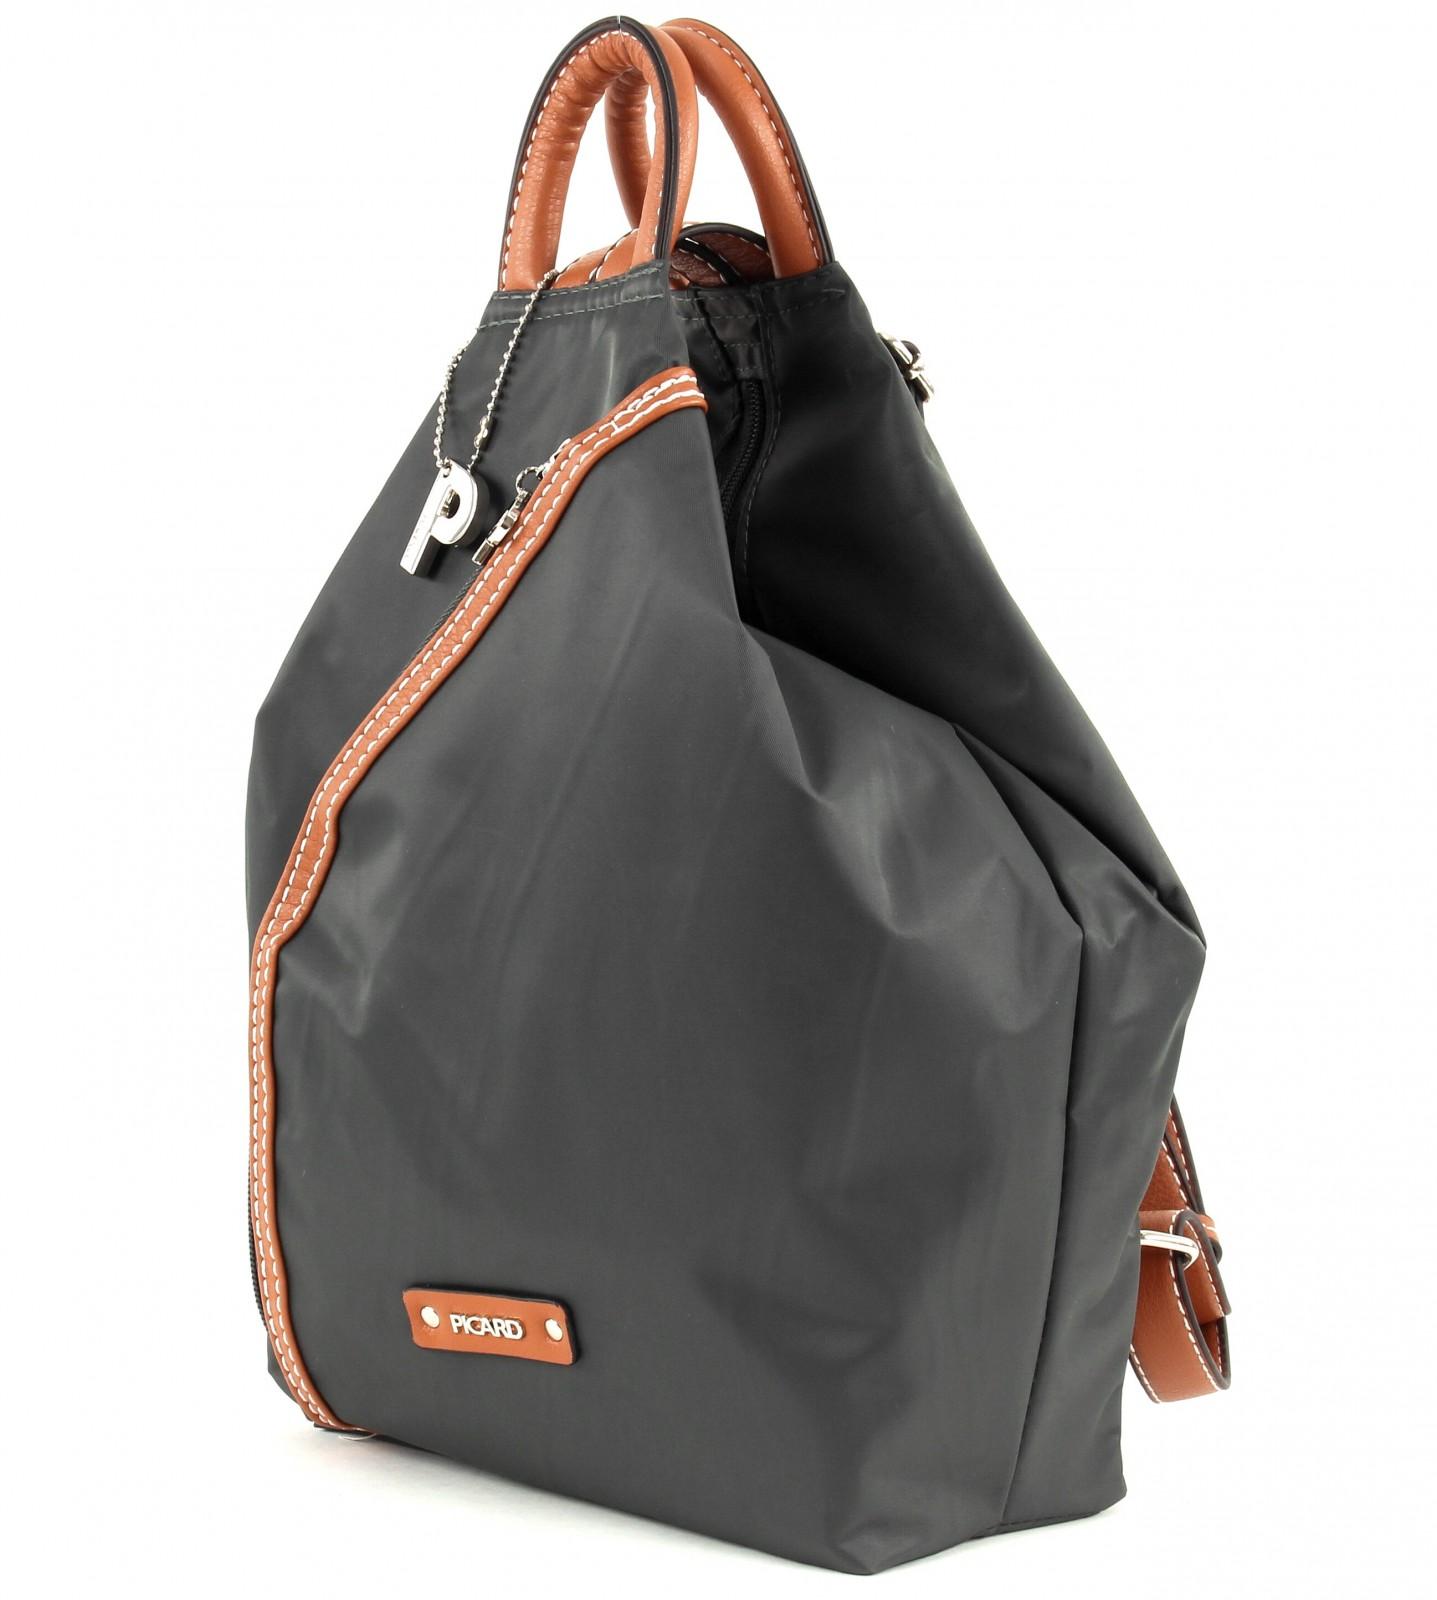 798577bb295b6 ... 58L 001Tap To ClosePICARD Sonja Backpack AnthrazitTap To CloseNur  möglich bei sofortigem Zahlungseingang mit Paypal